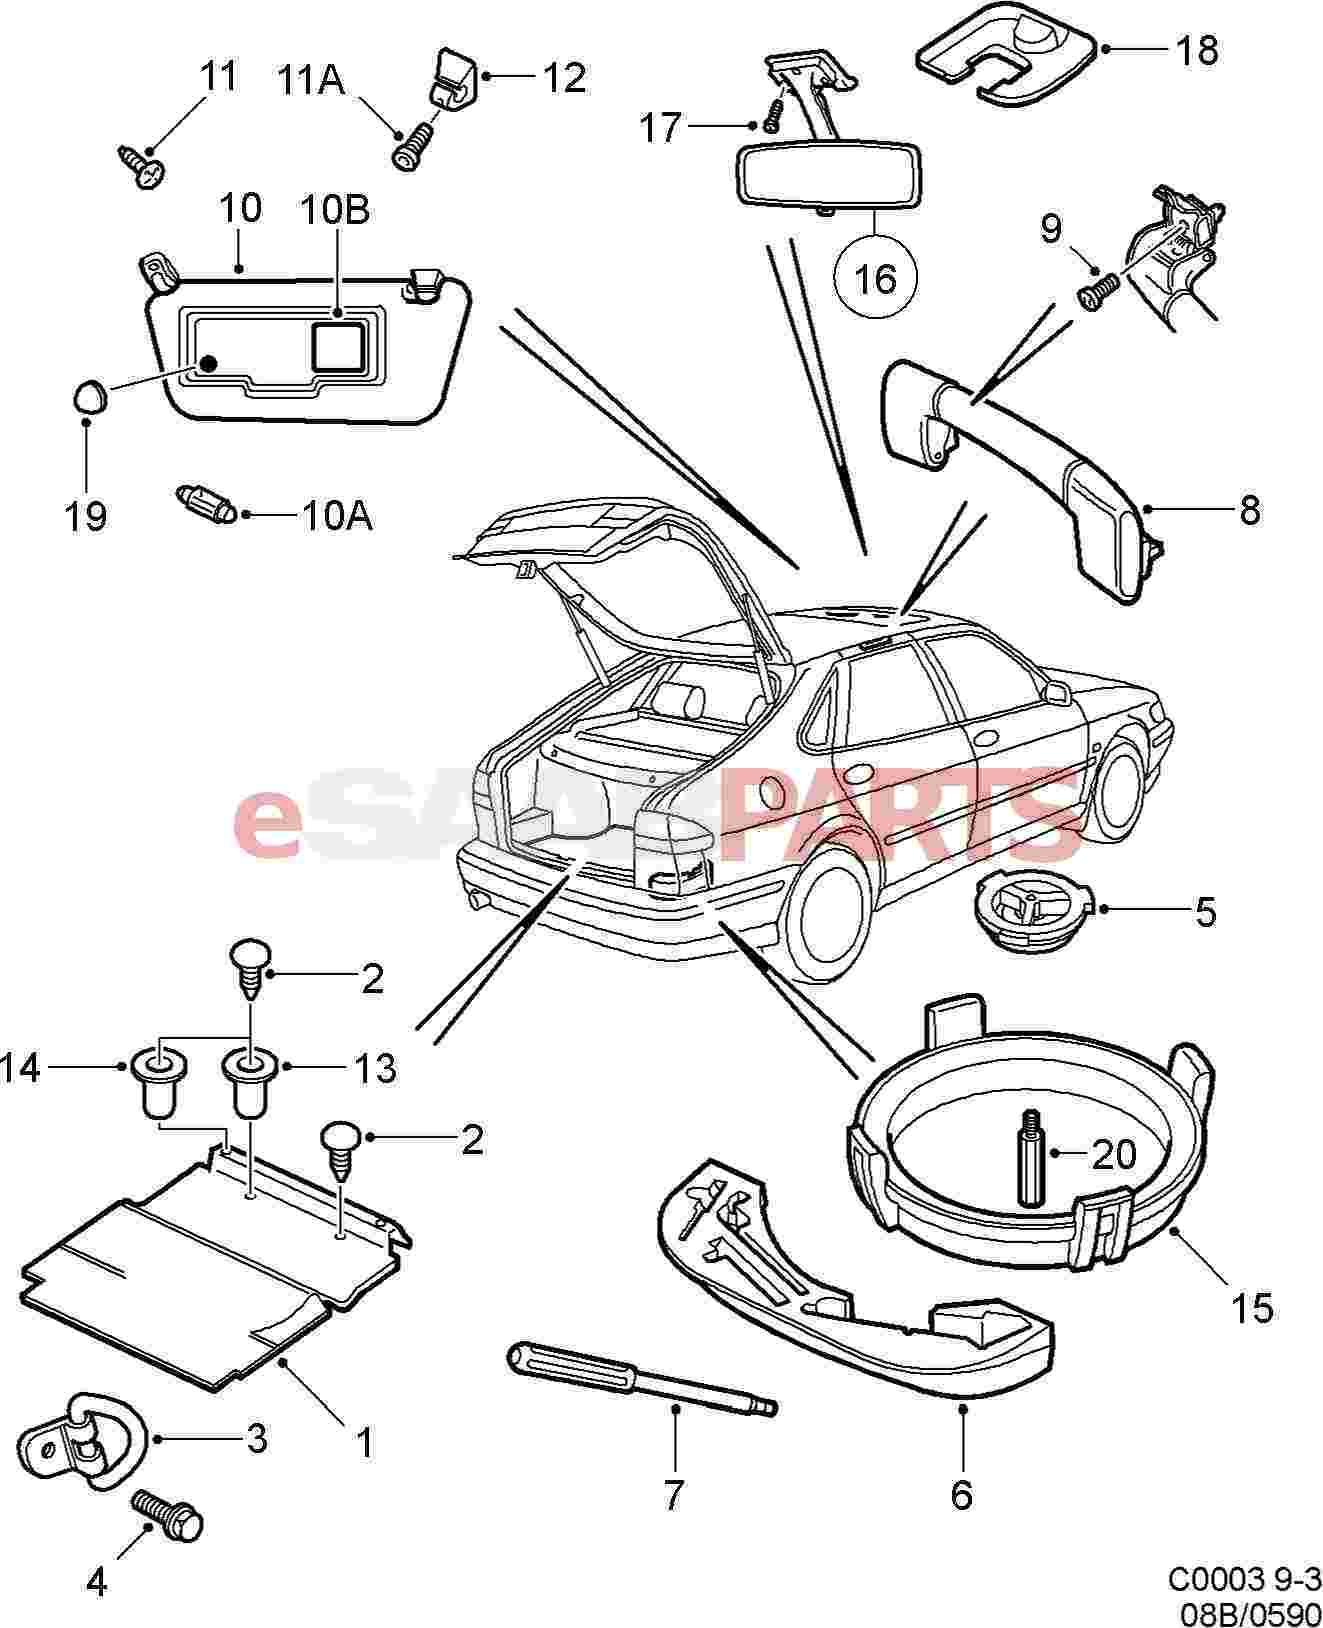 Saab 9 3 Parts Diagram Interior. Saab. Auto Wiring Diagram